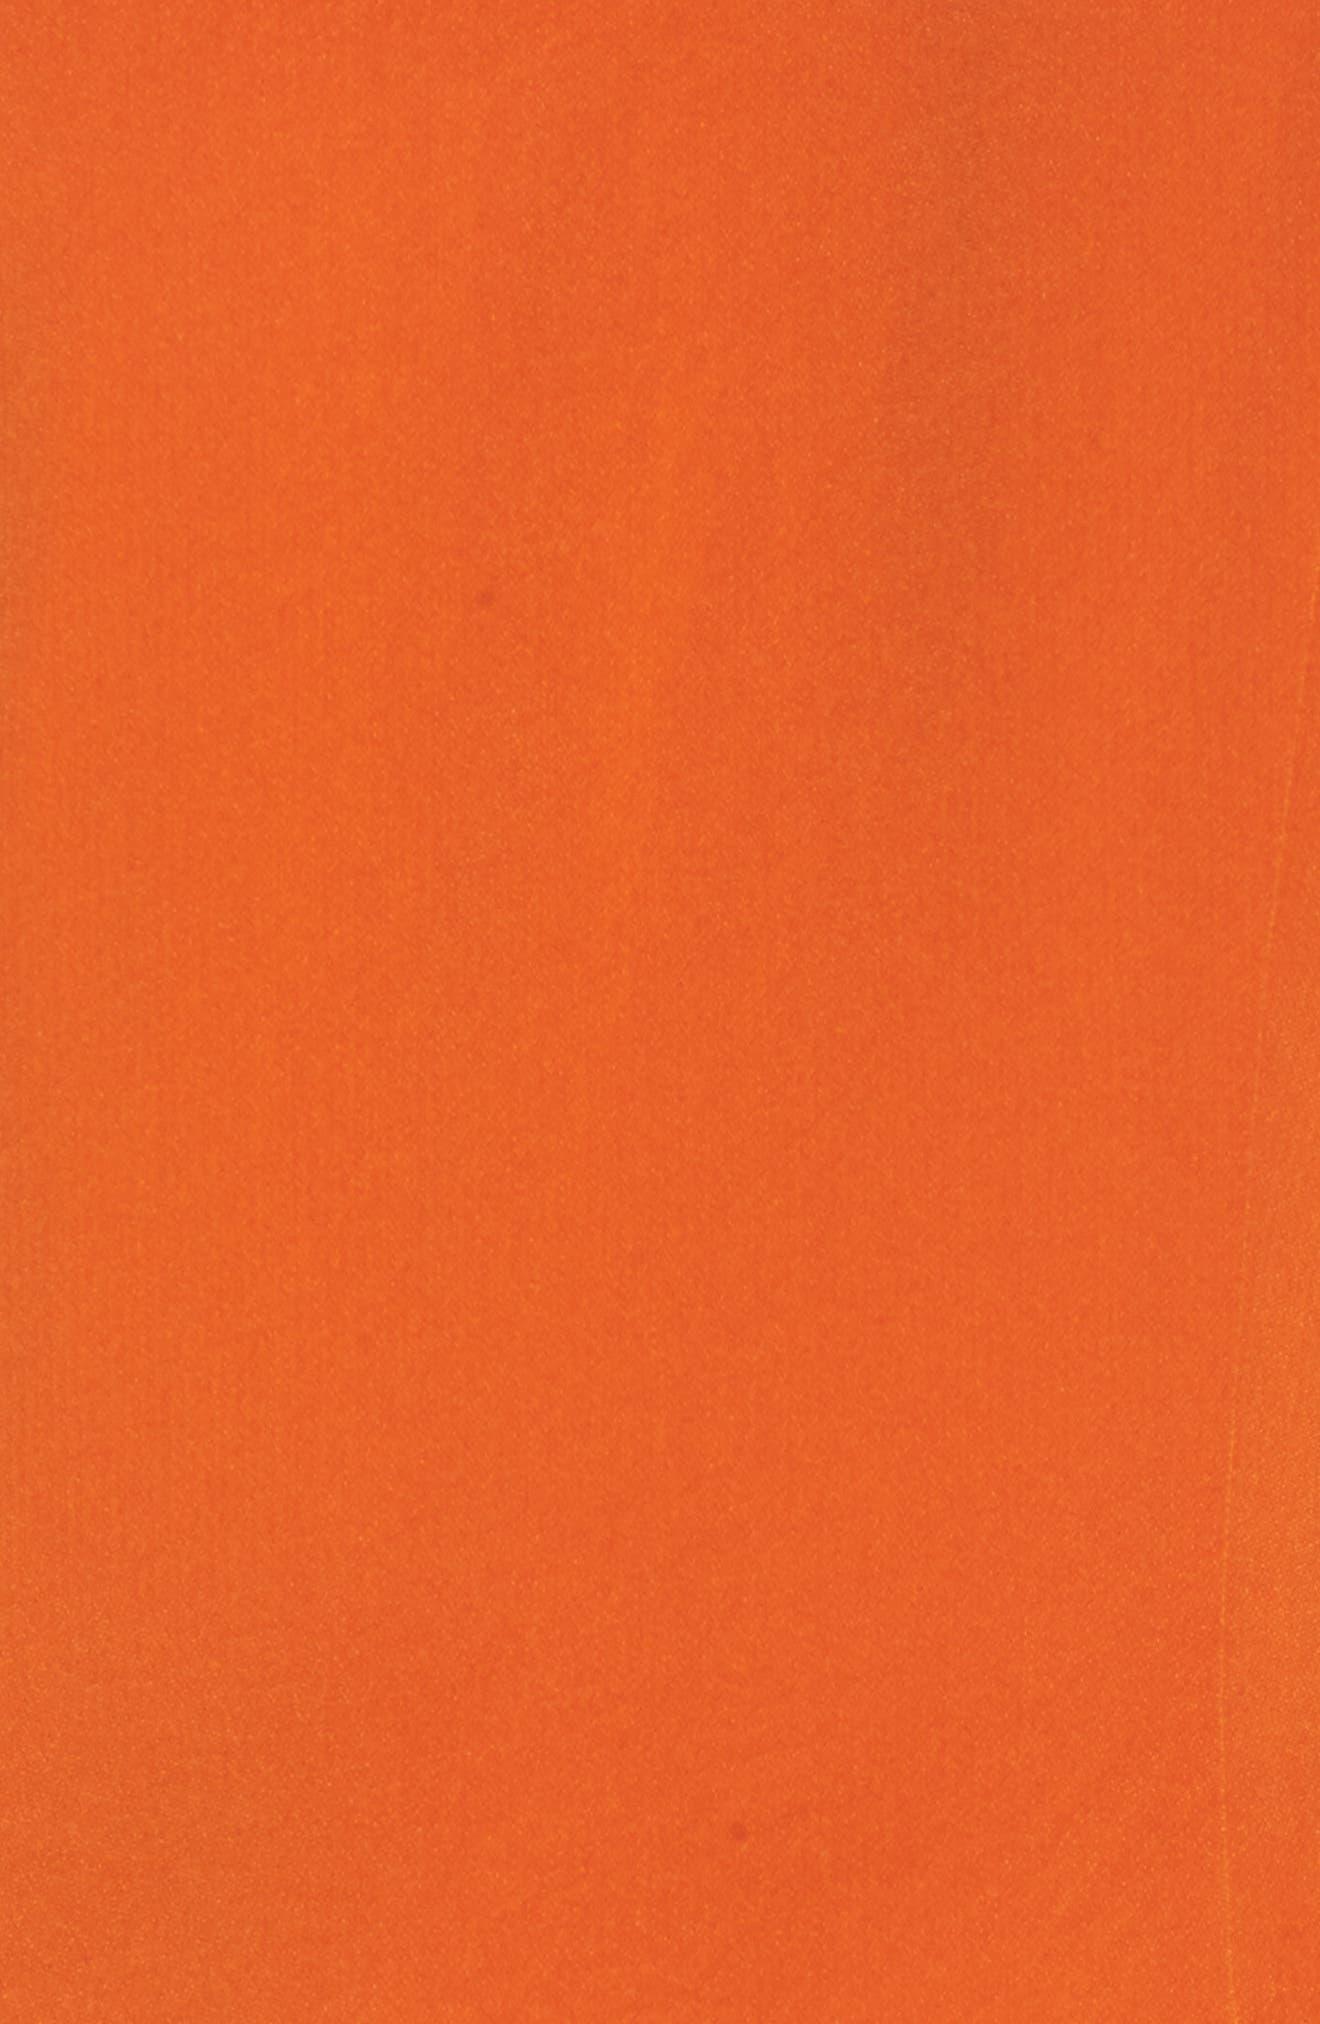 Sofia Short Sleeve Sheath Dress,                             Alternate thumbnail 6, color,                             ORANGE